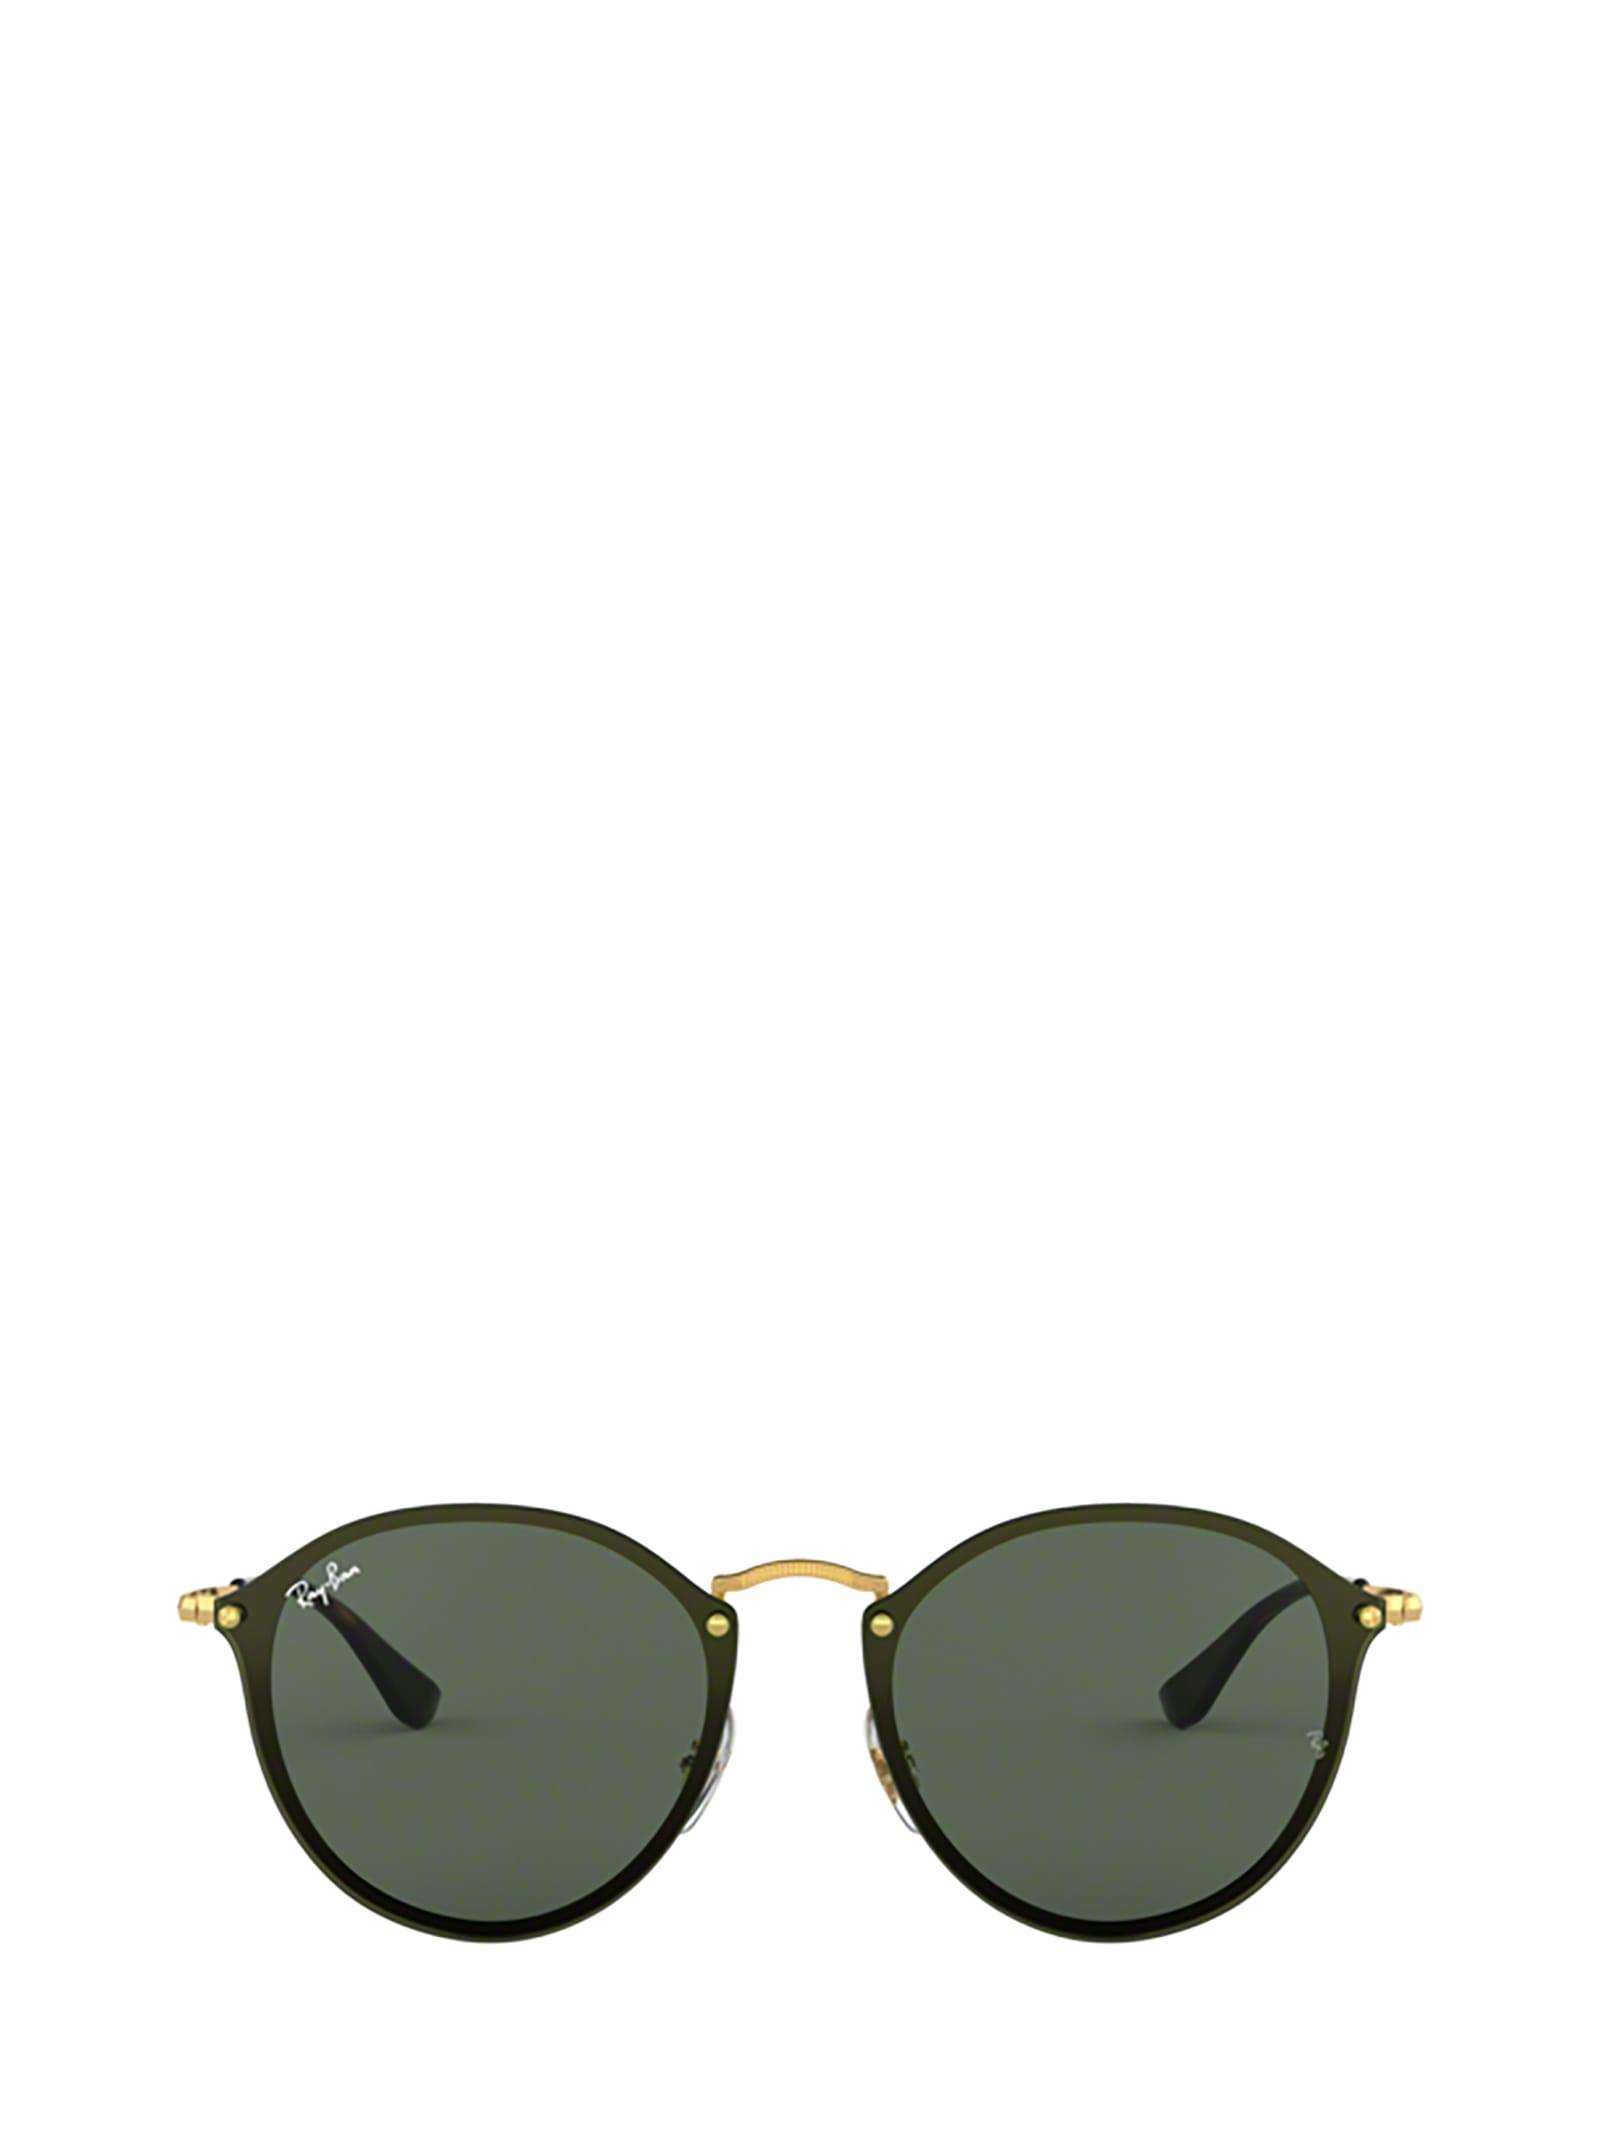 Ray-Ban Ray-ban Rb3574n Arista Sunglasses